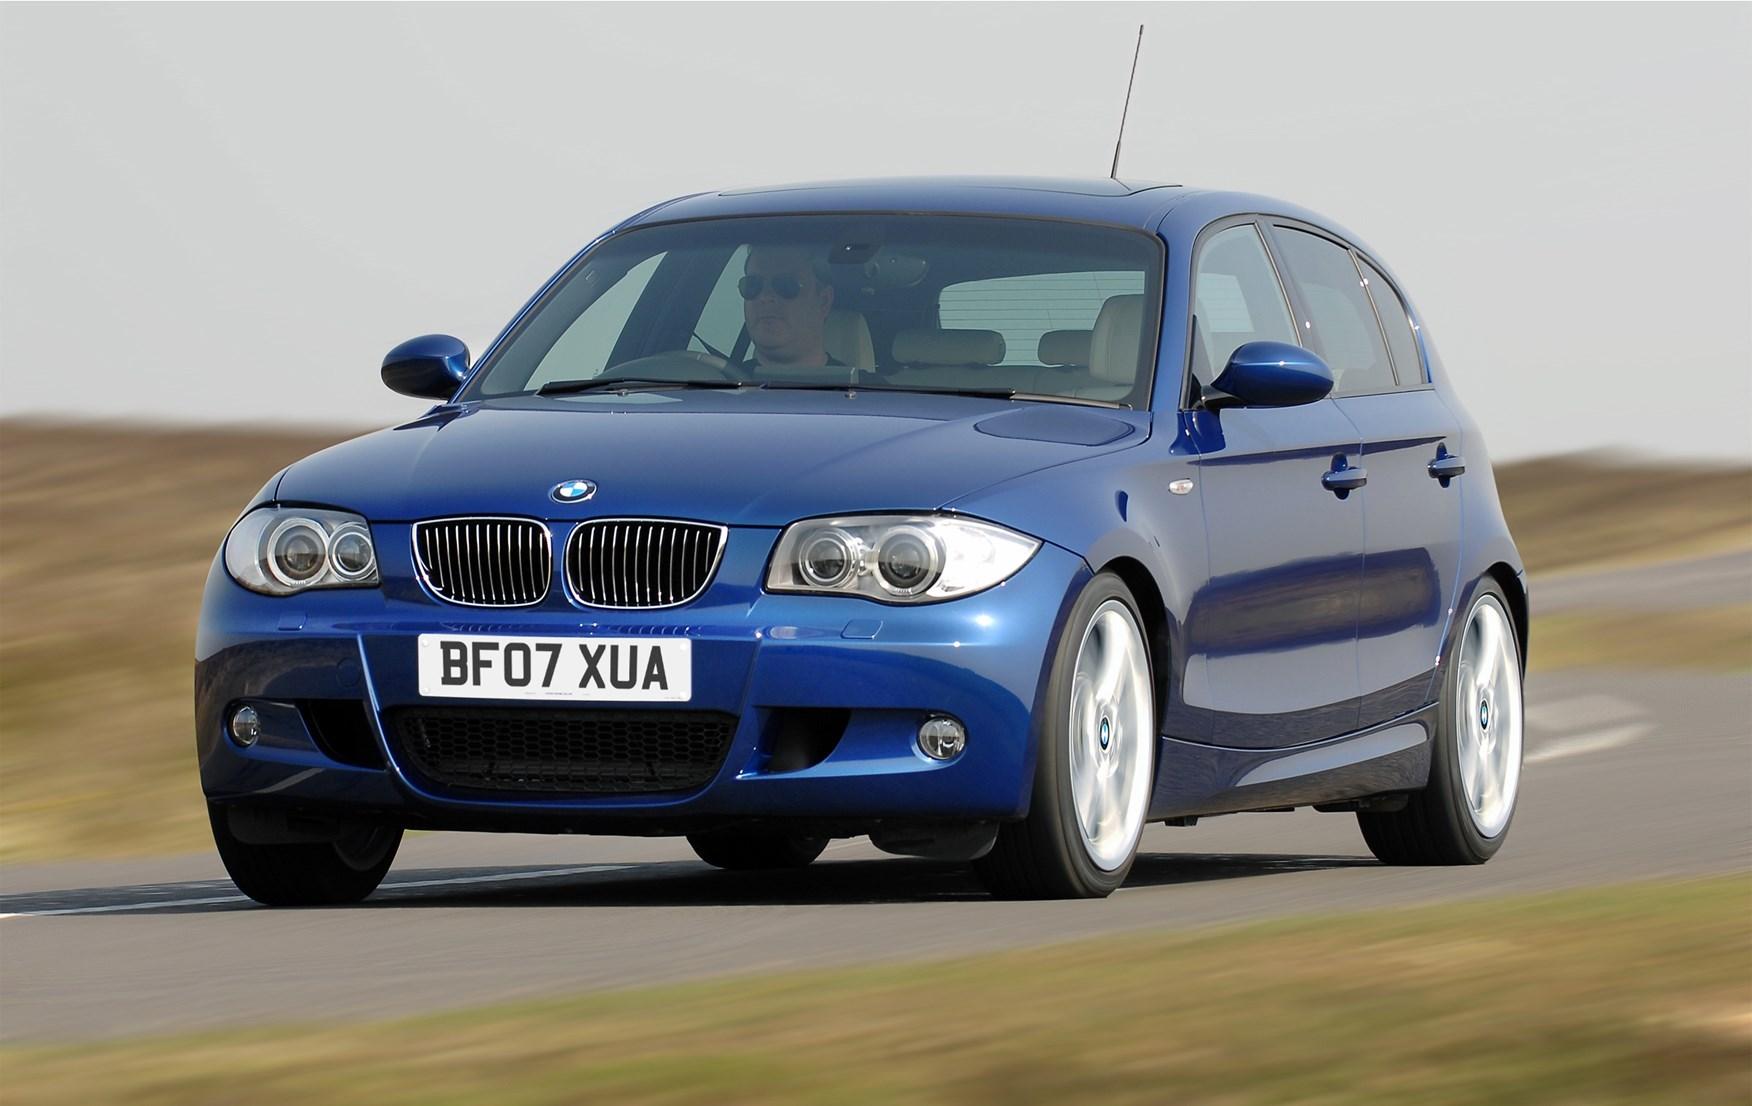 2007 BMW 1-series